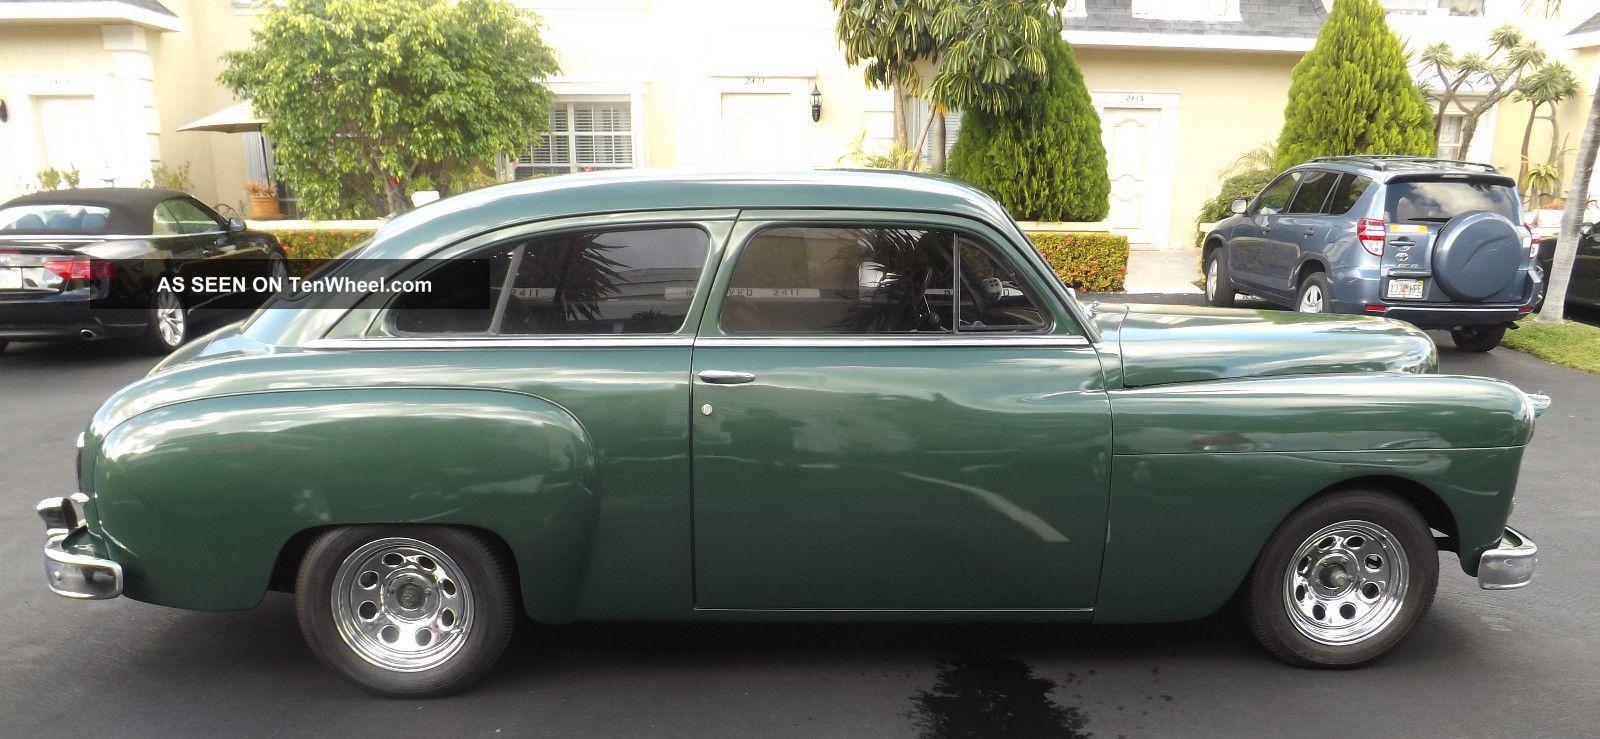 1950 4 wheel drive autos post for 1950 dodge 2 door coupe